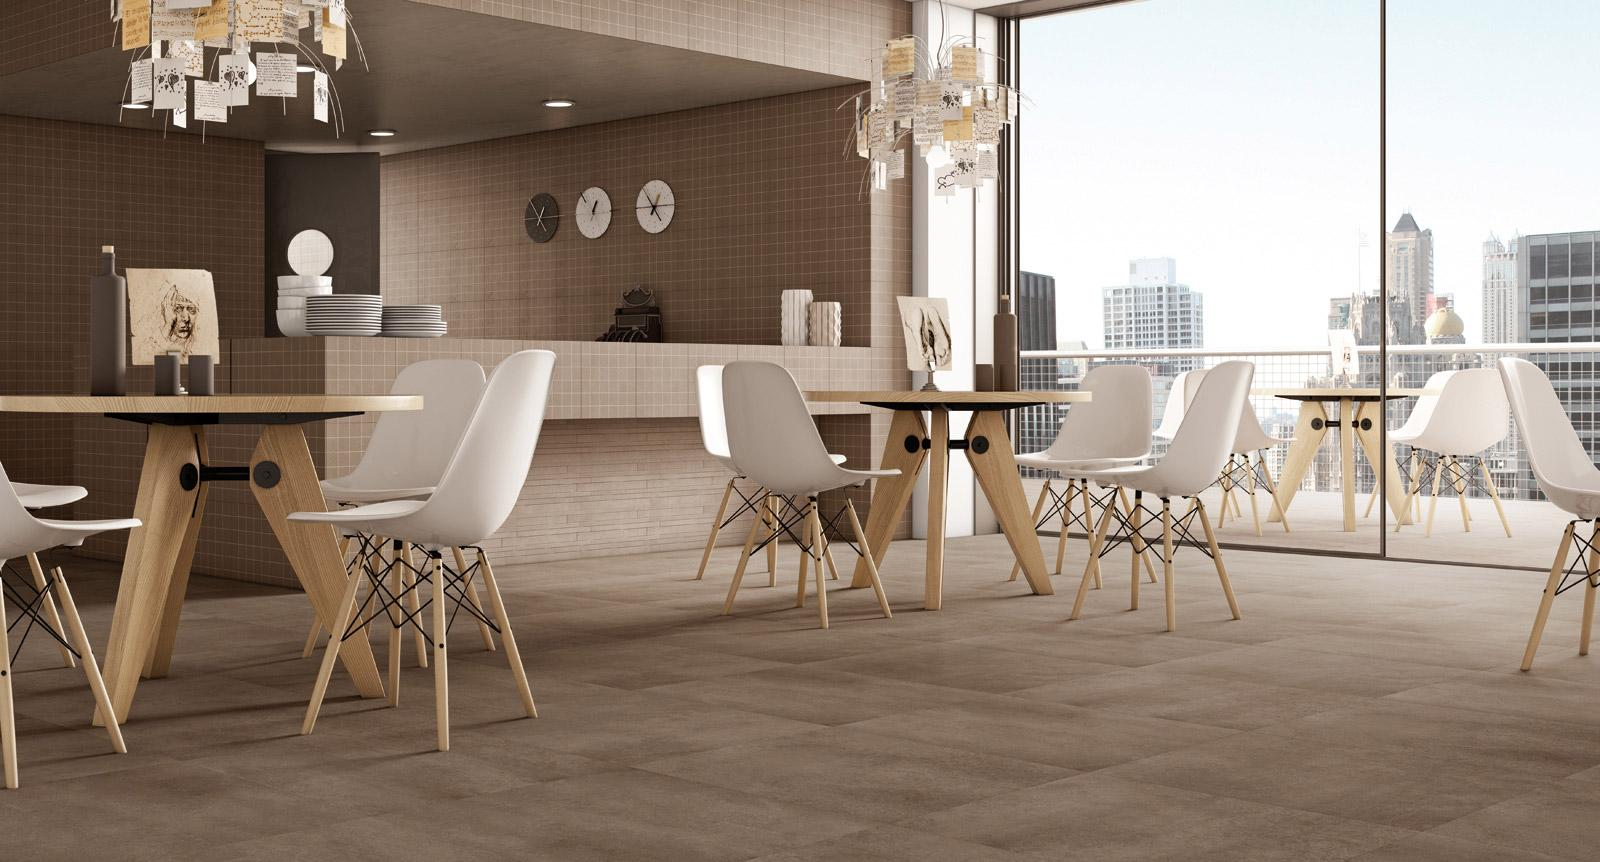 Denver indoor porcelain stoneware marazzi denver concrete effect businesses dailygadgetfo Images